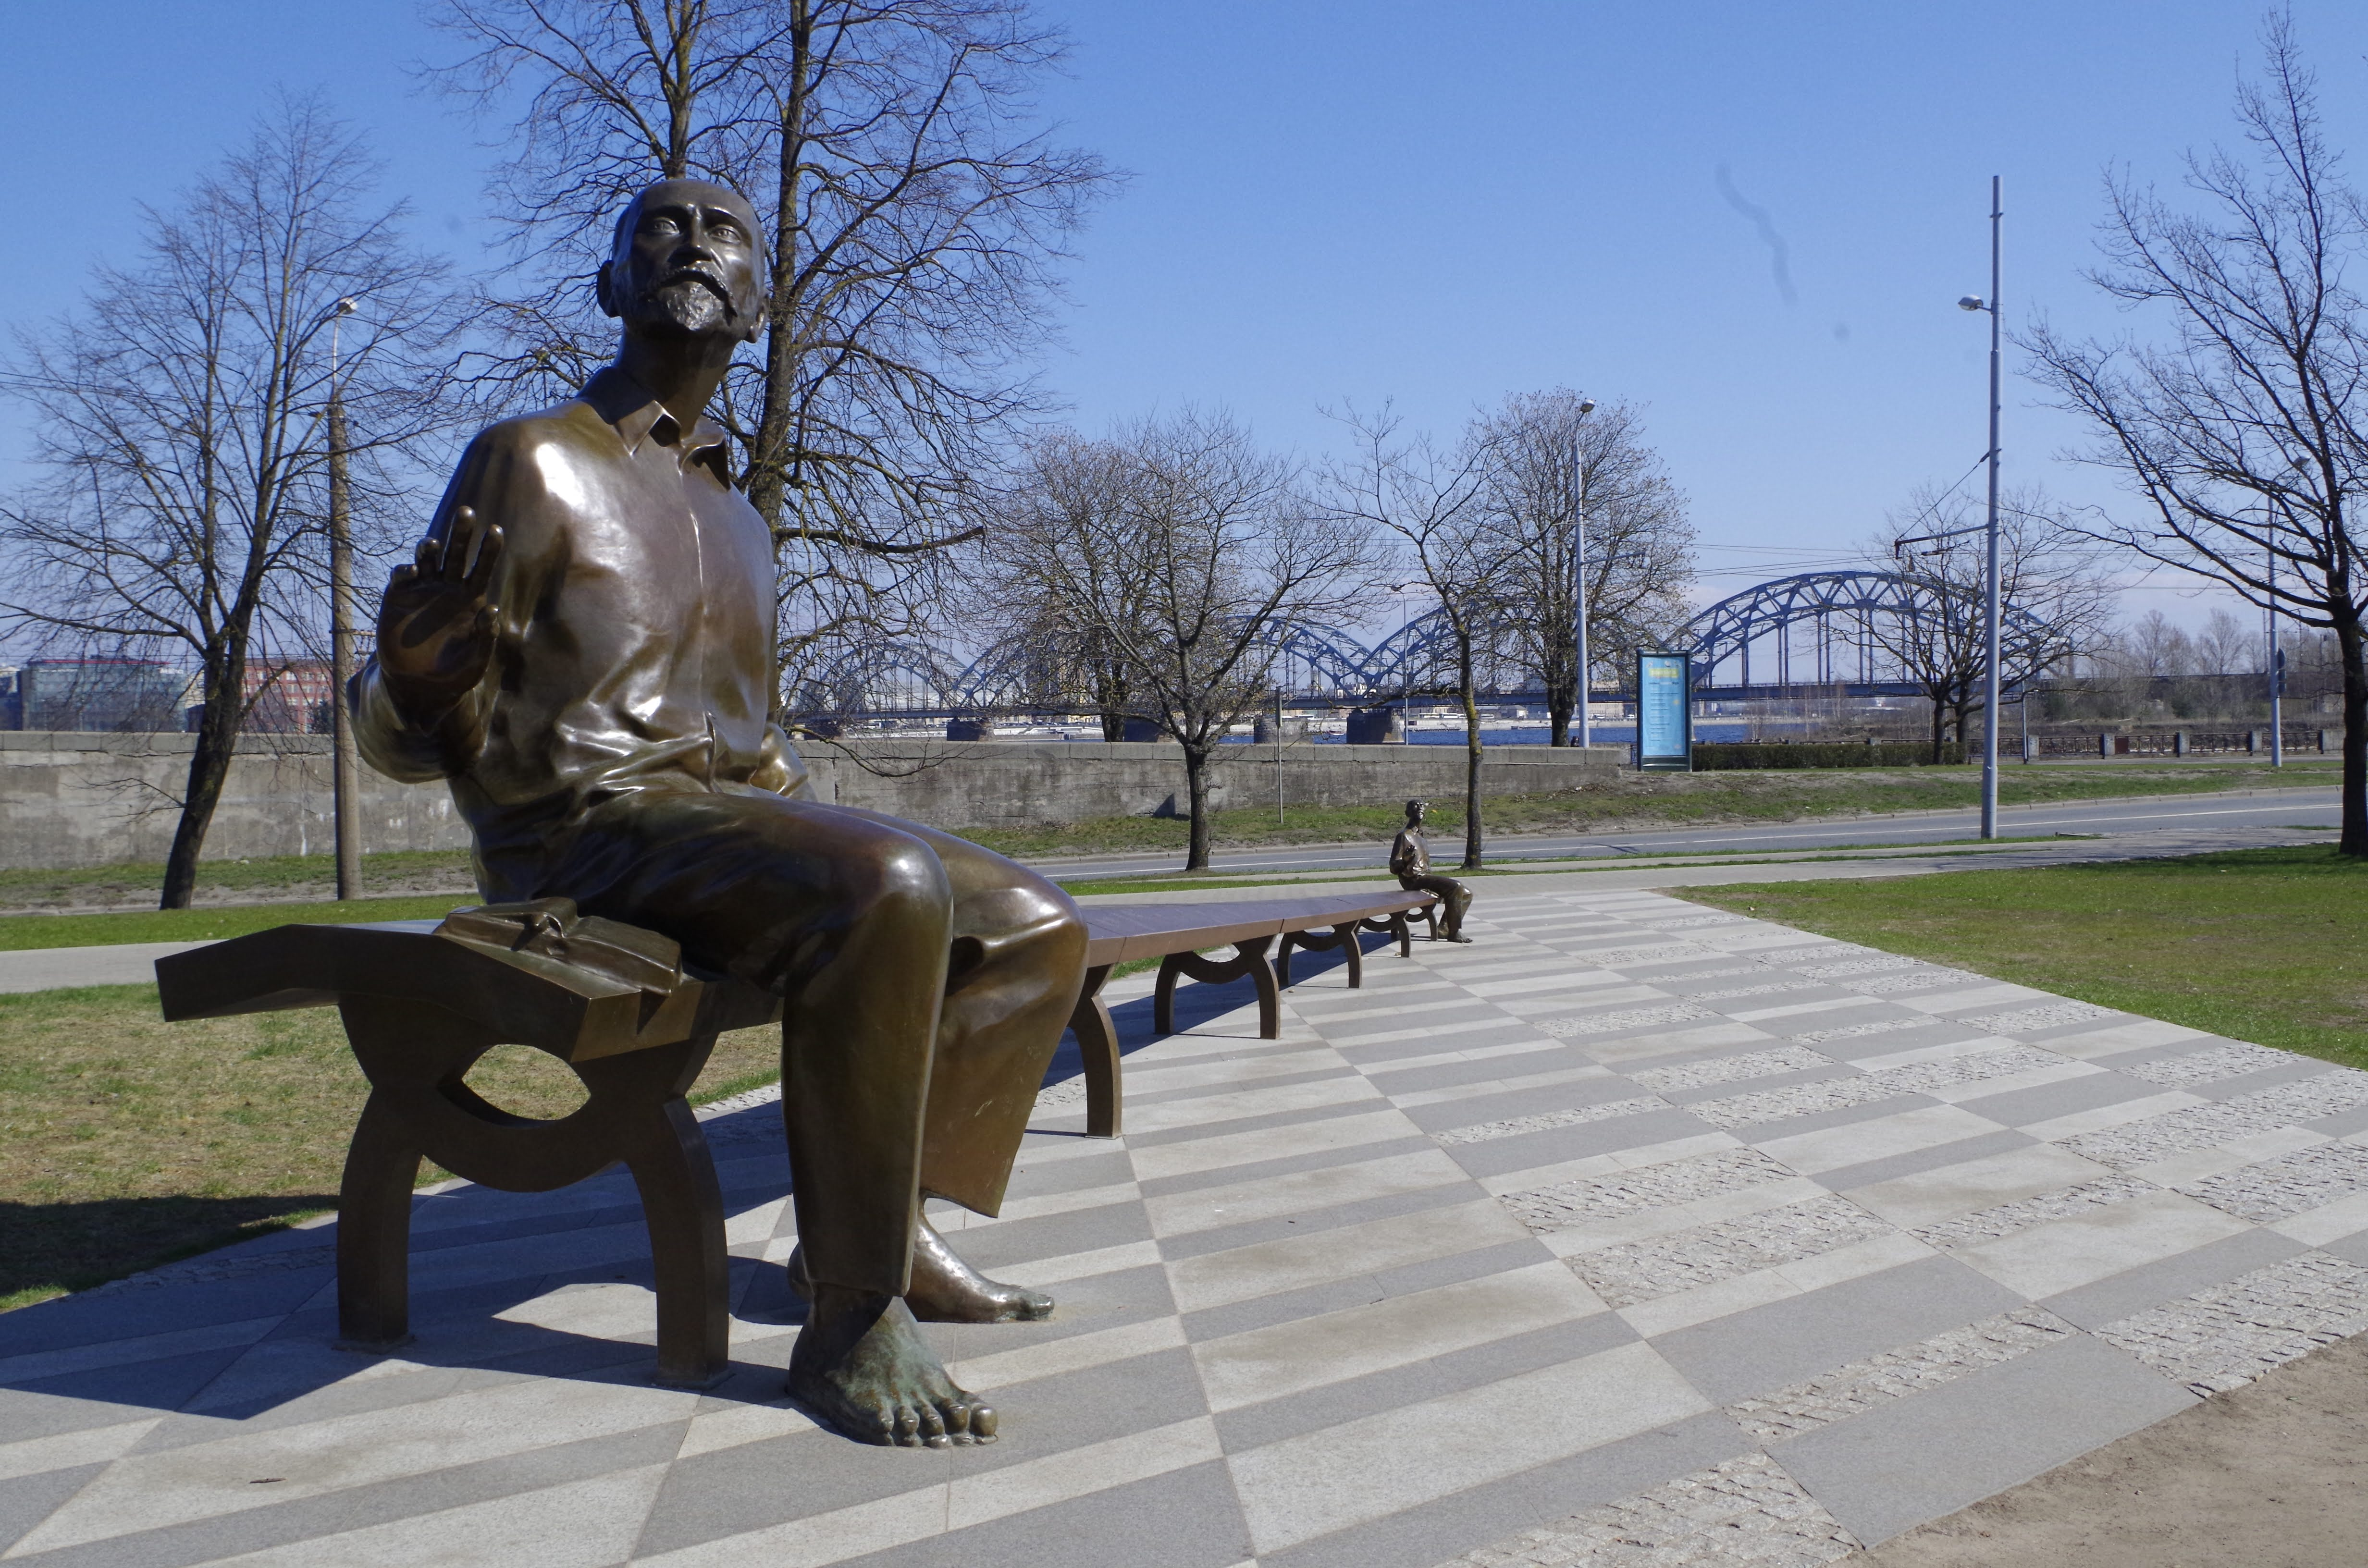 Skulptur vor der Nationalbibliothek in Riga, Lettland.